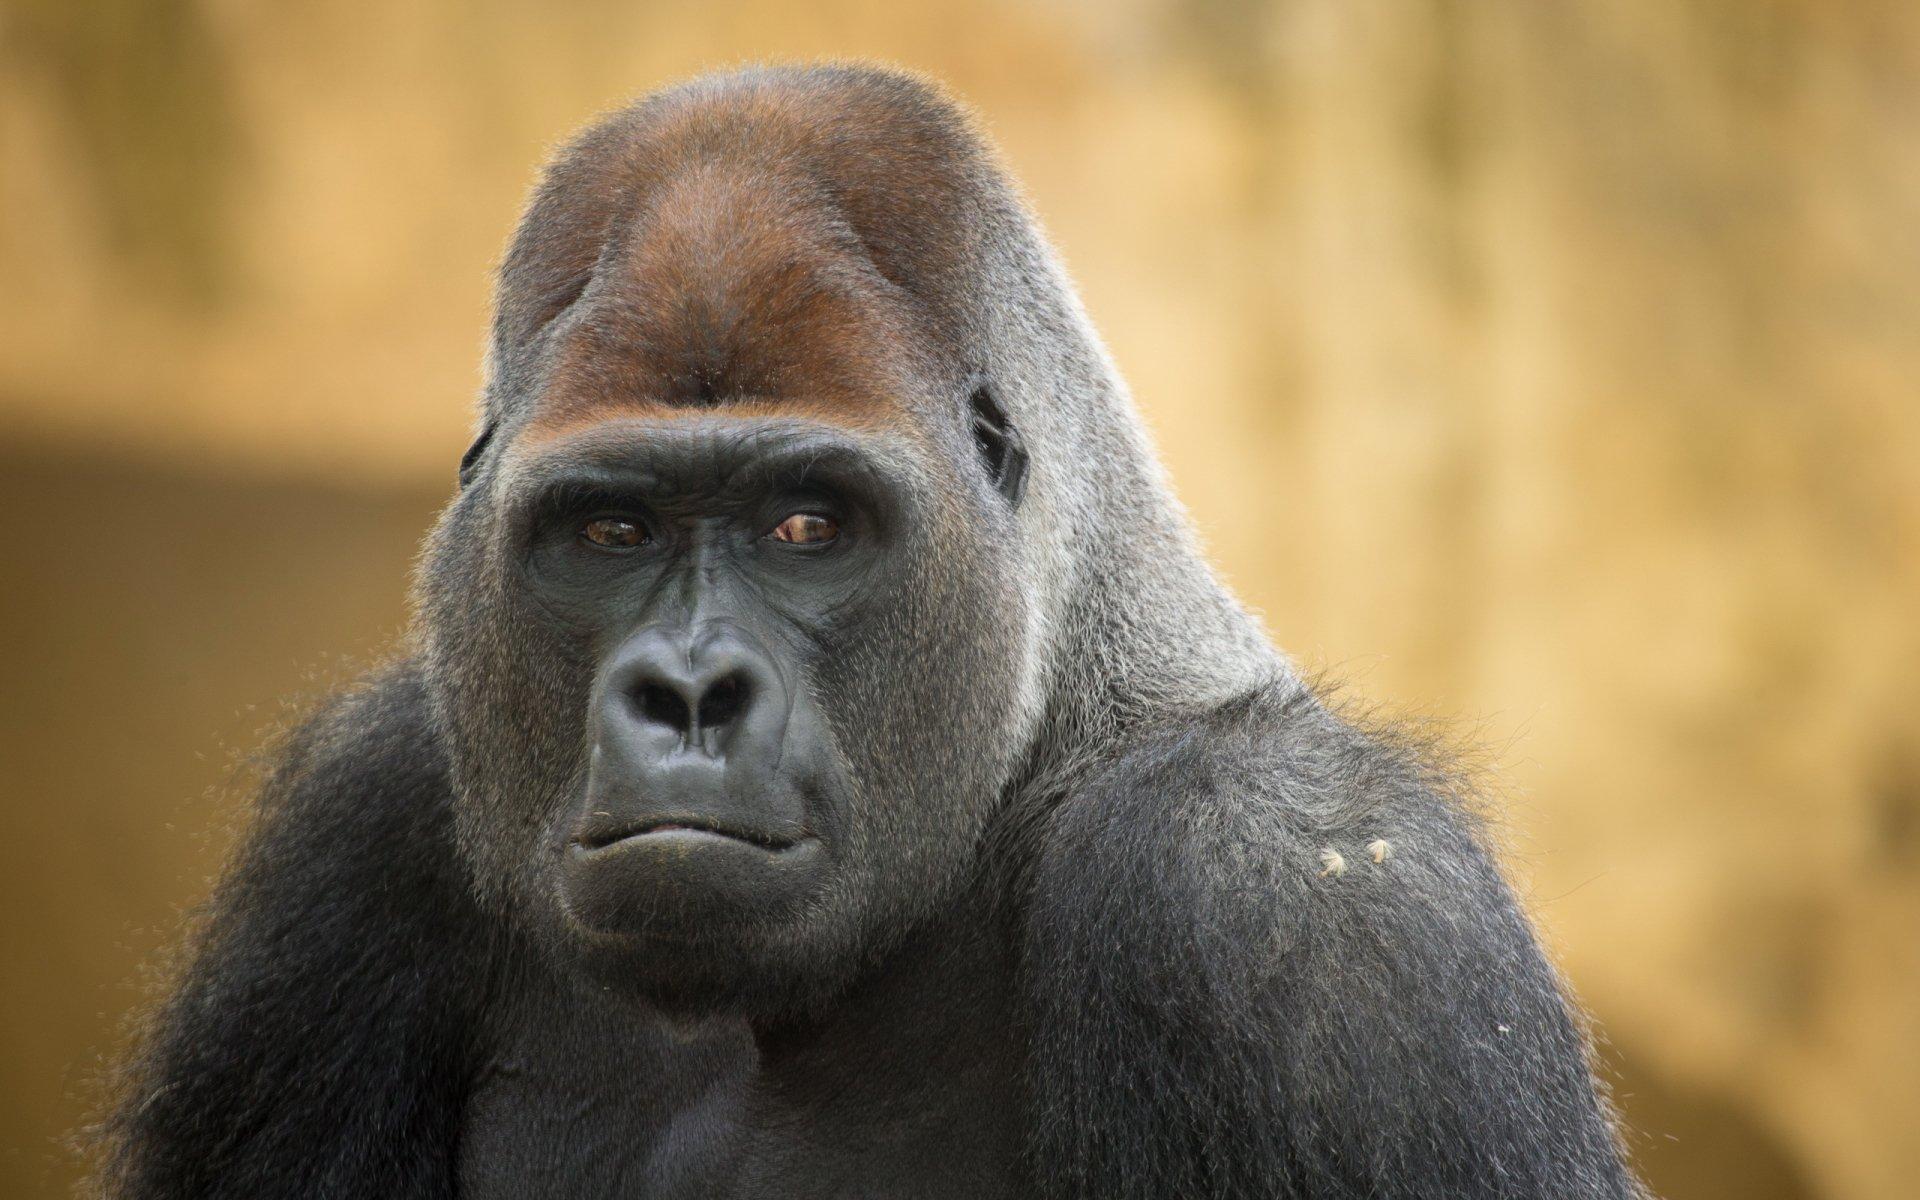 Male Silverback Gorilla Full HD Wallpaper And Background